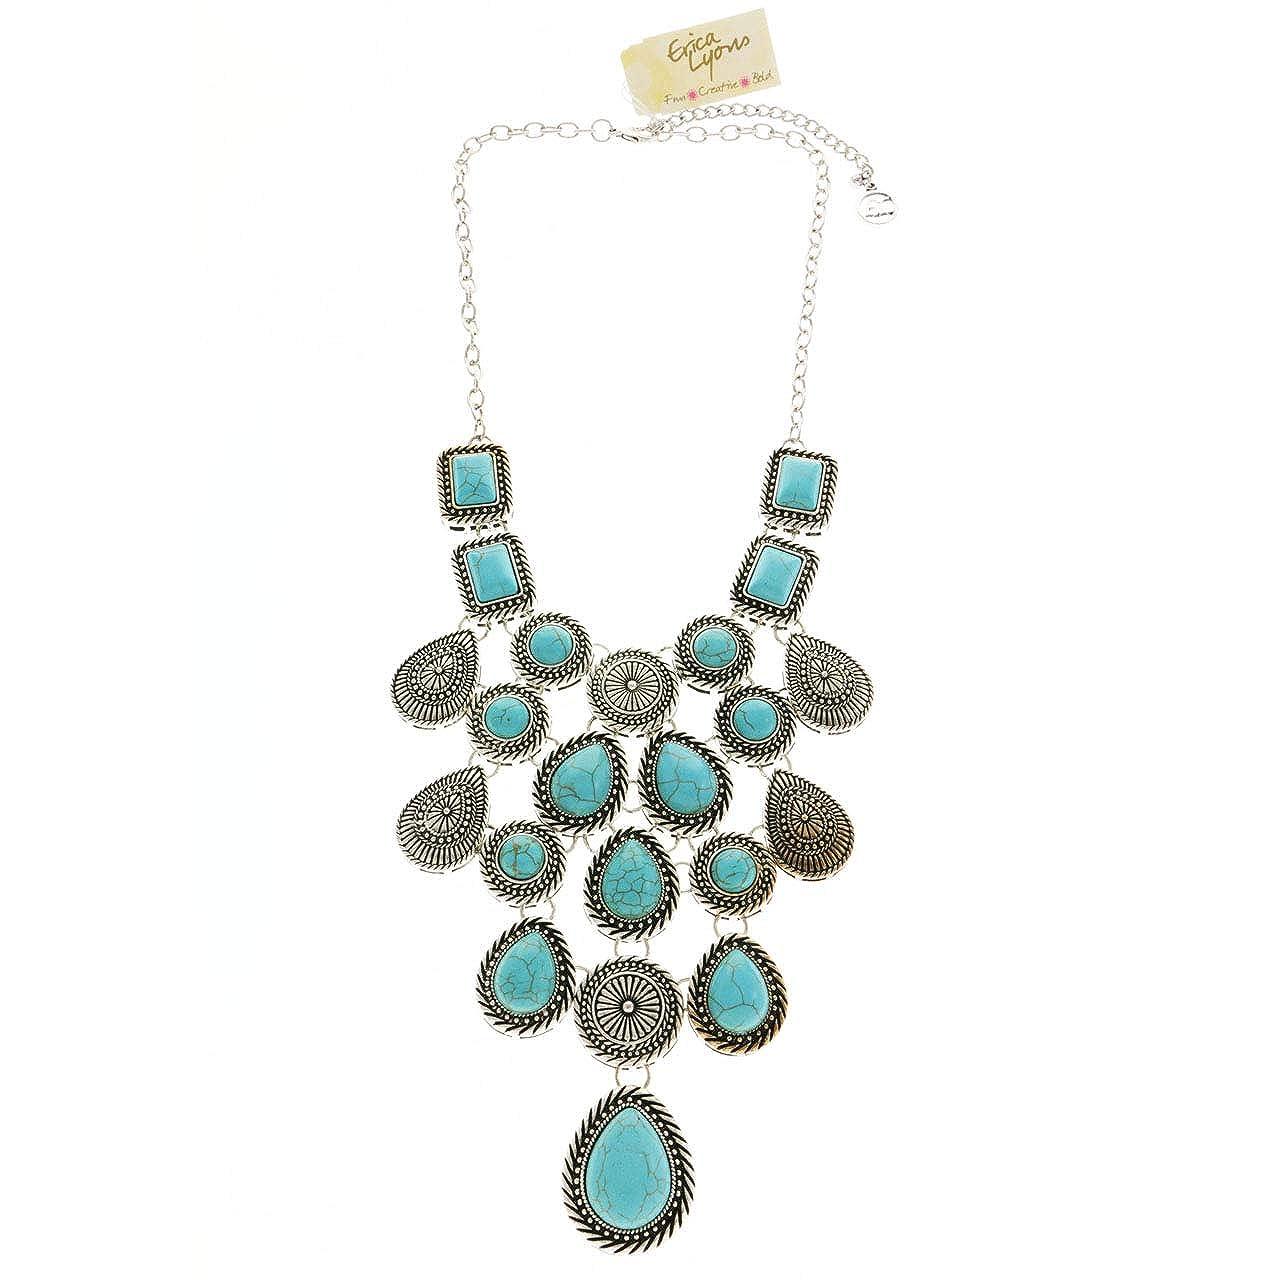 Erica Lyons Velvet Gift Bag Turquoise Bib Statement-Necklace Blue /& Silver-Tone